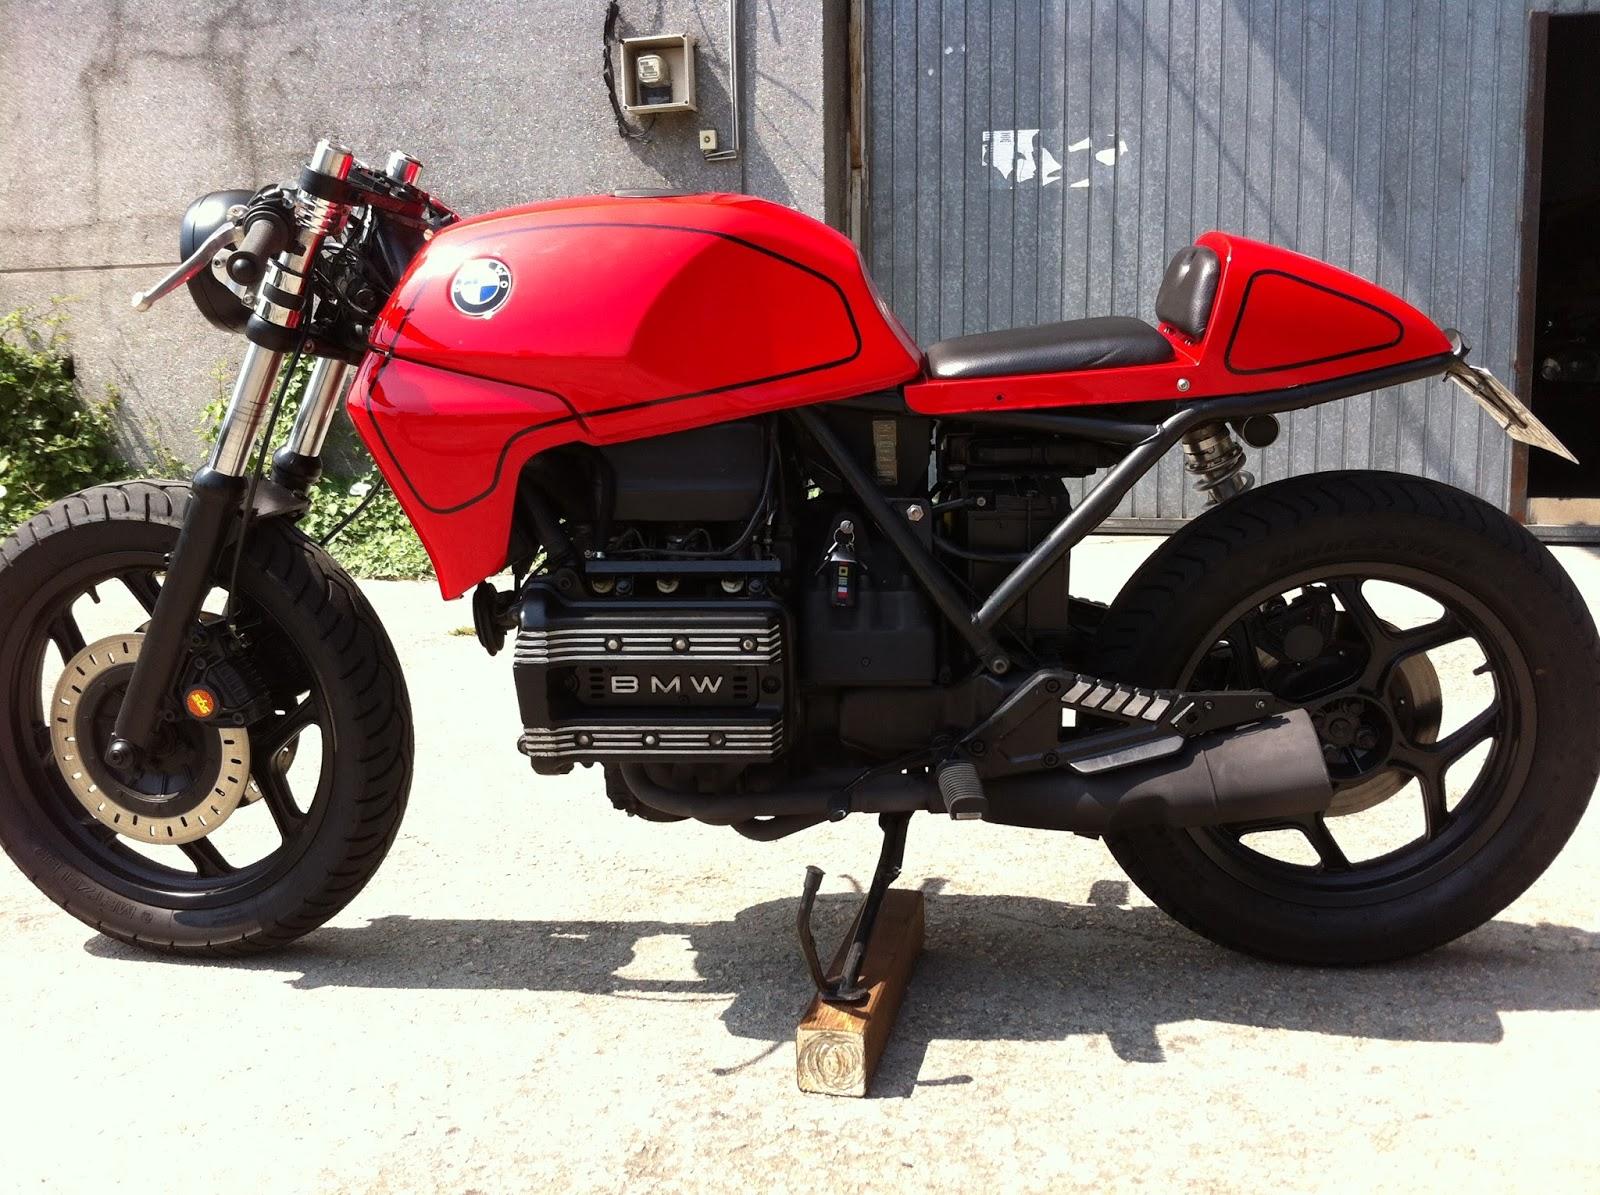 moto bmw k 75 – car image idea